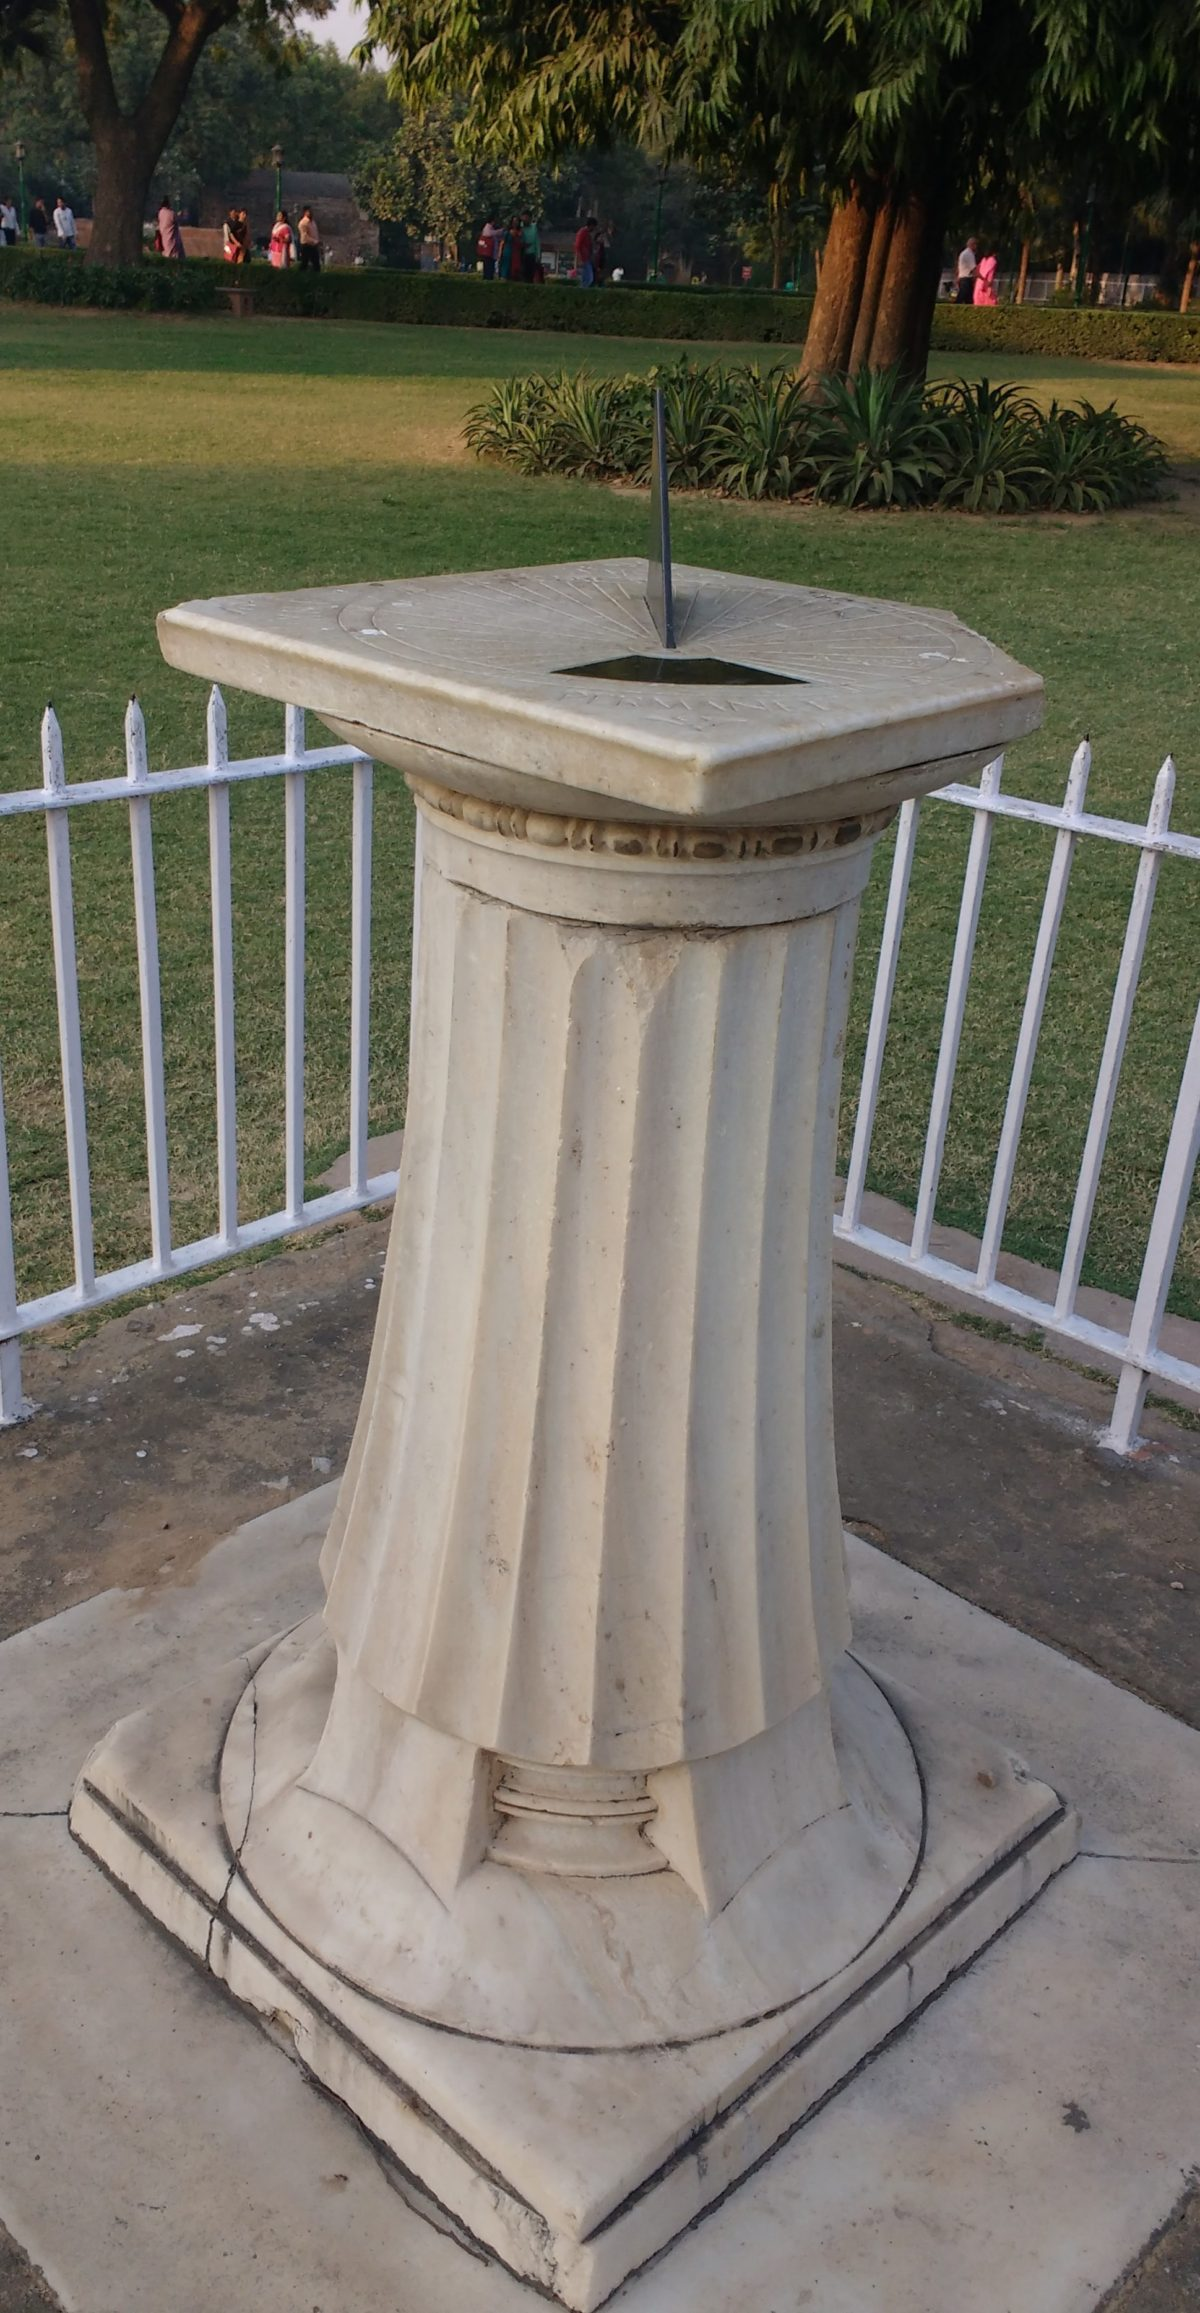 Sanderson's Sundial at Qutub Minar Complex